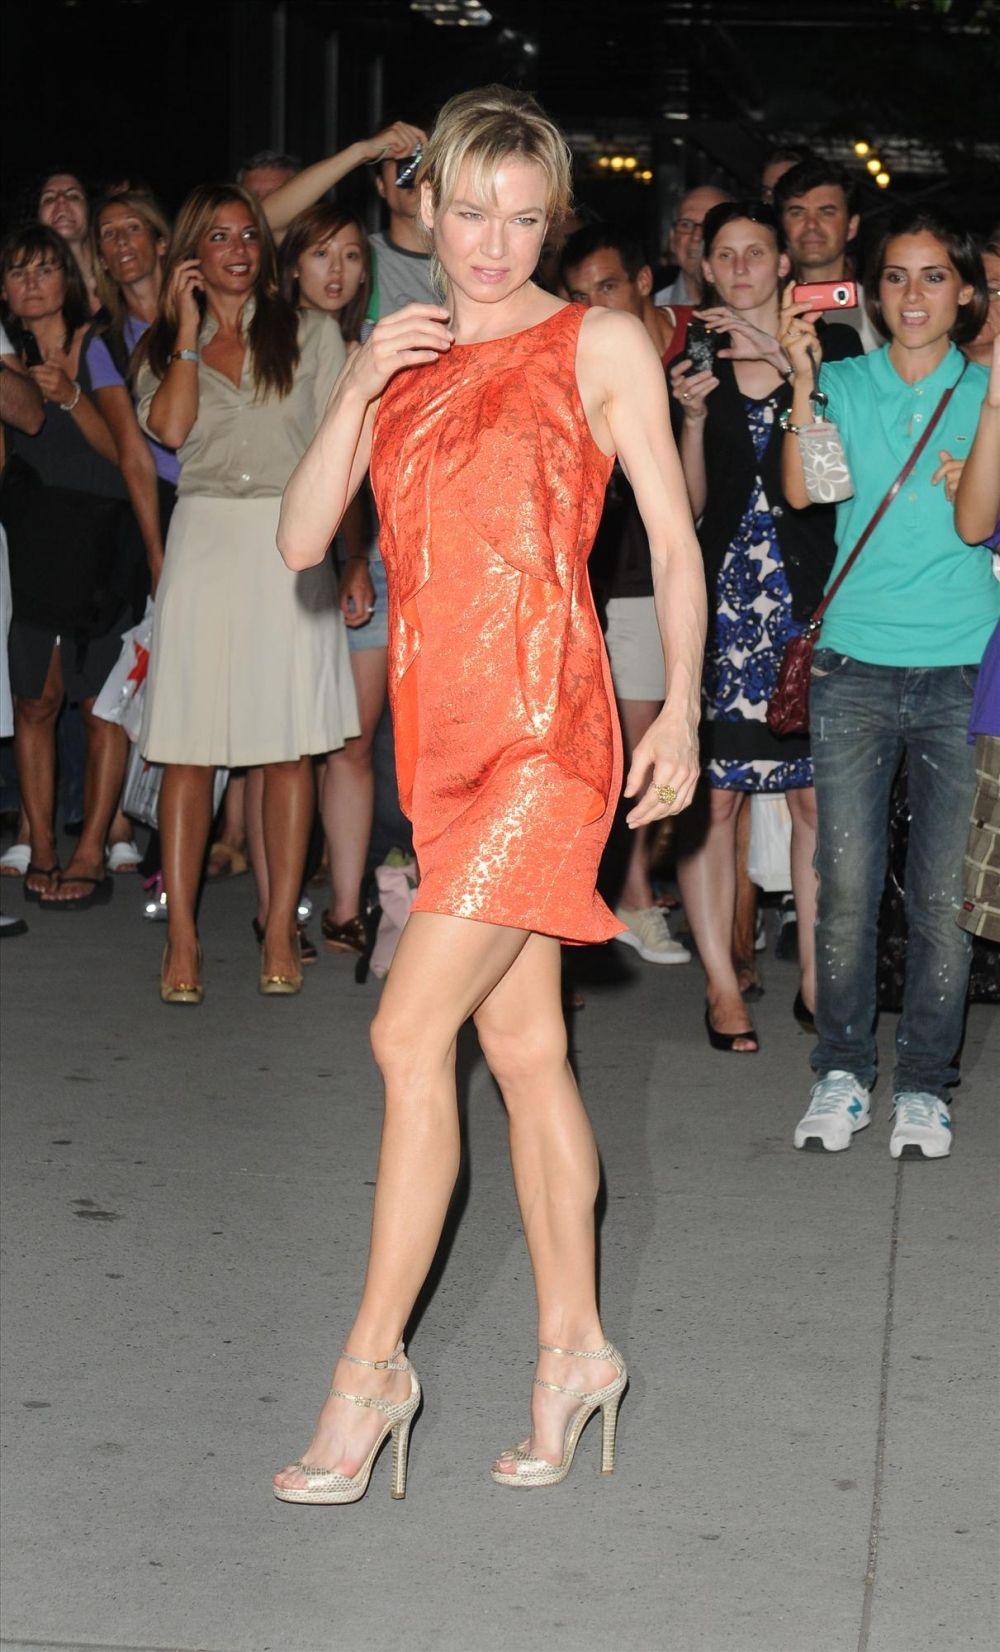 Renee Zellweger Fake Nude Beautiful renee zellweger fantastic legs | renee zellweger | pinterest